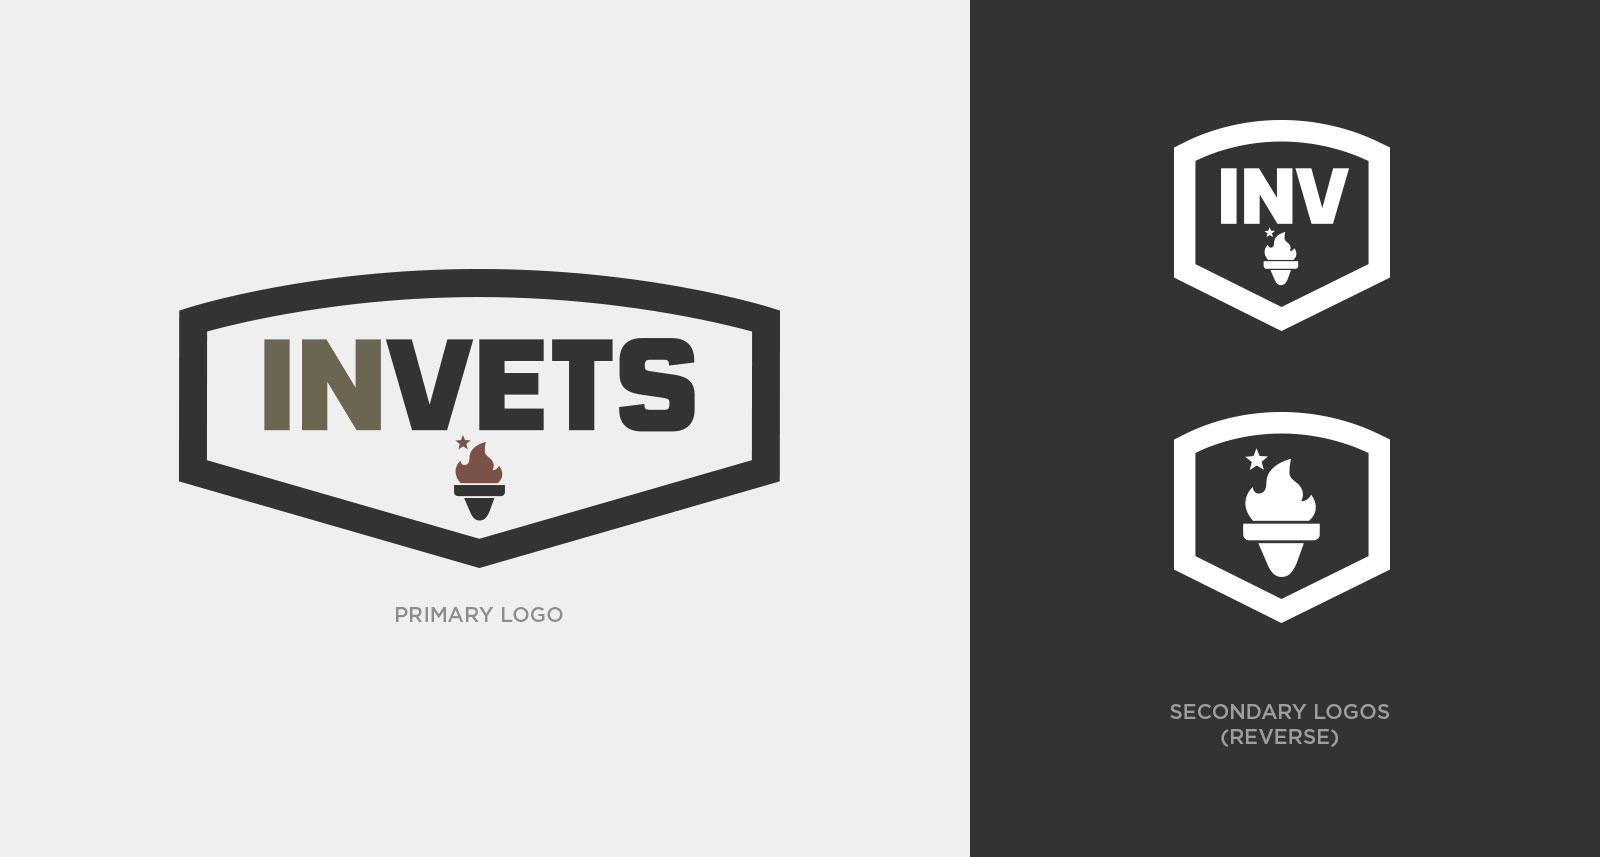 INvets logo redesign